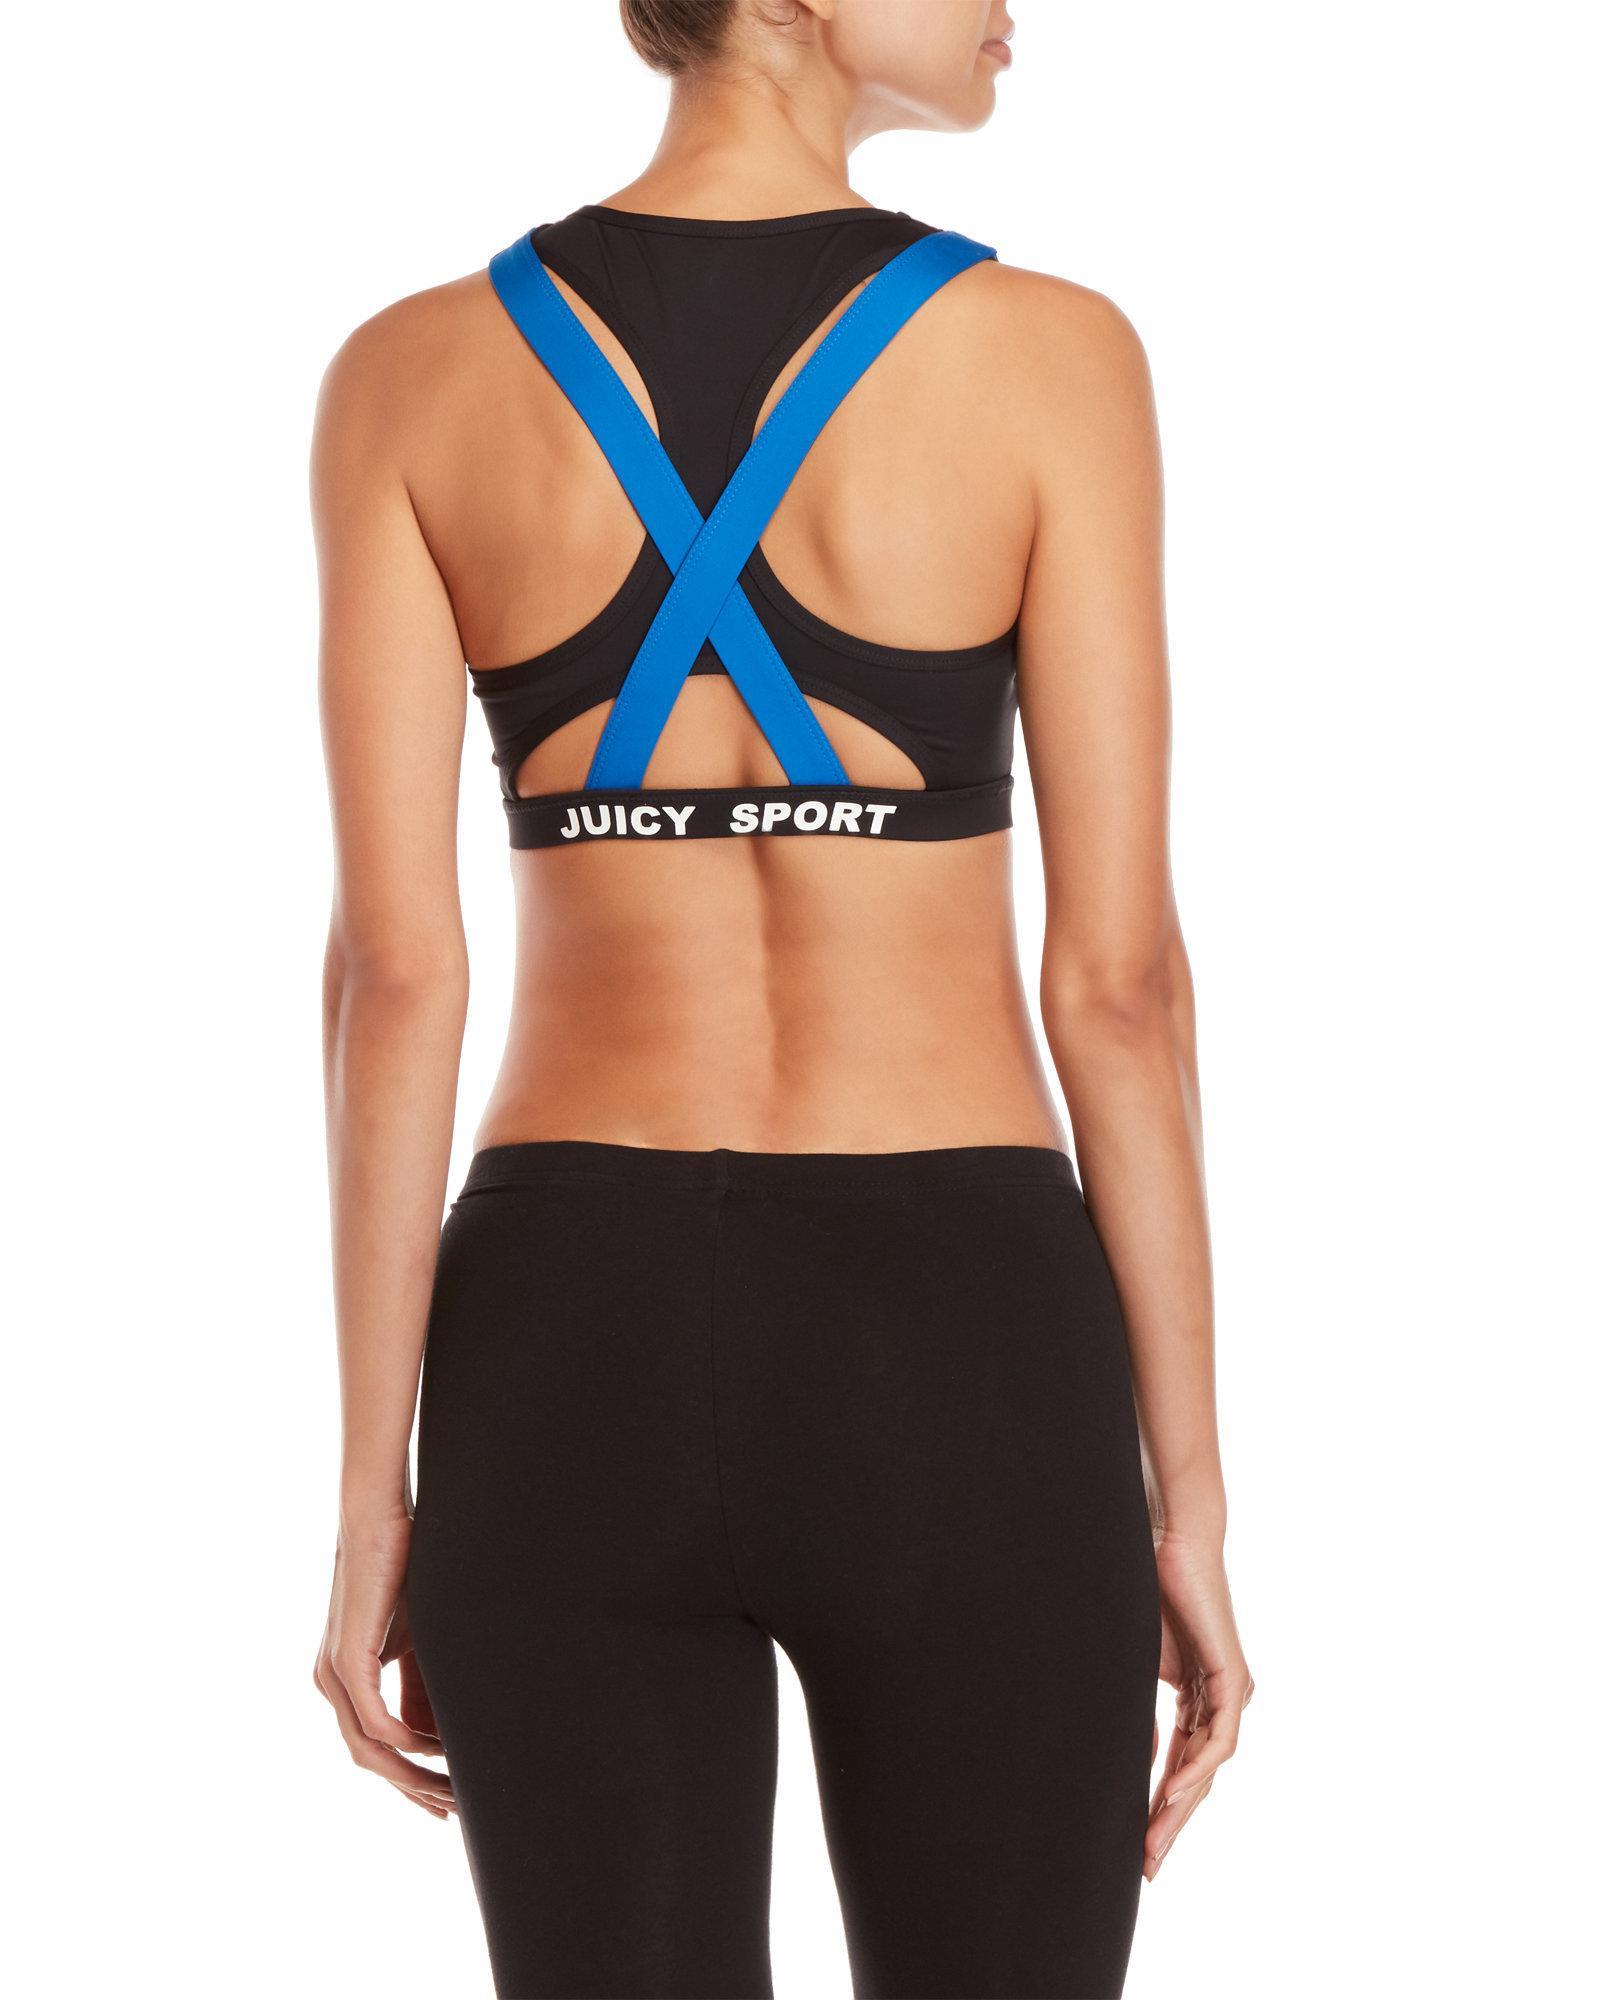 3c8af6e78a33f Lyst - Juicy Couture 2fer Halter Sports Bra in Black